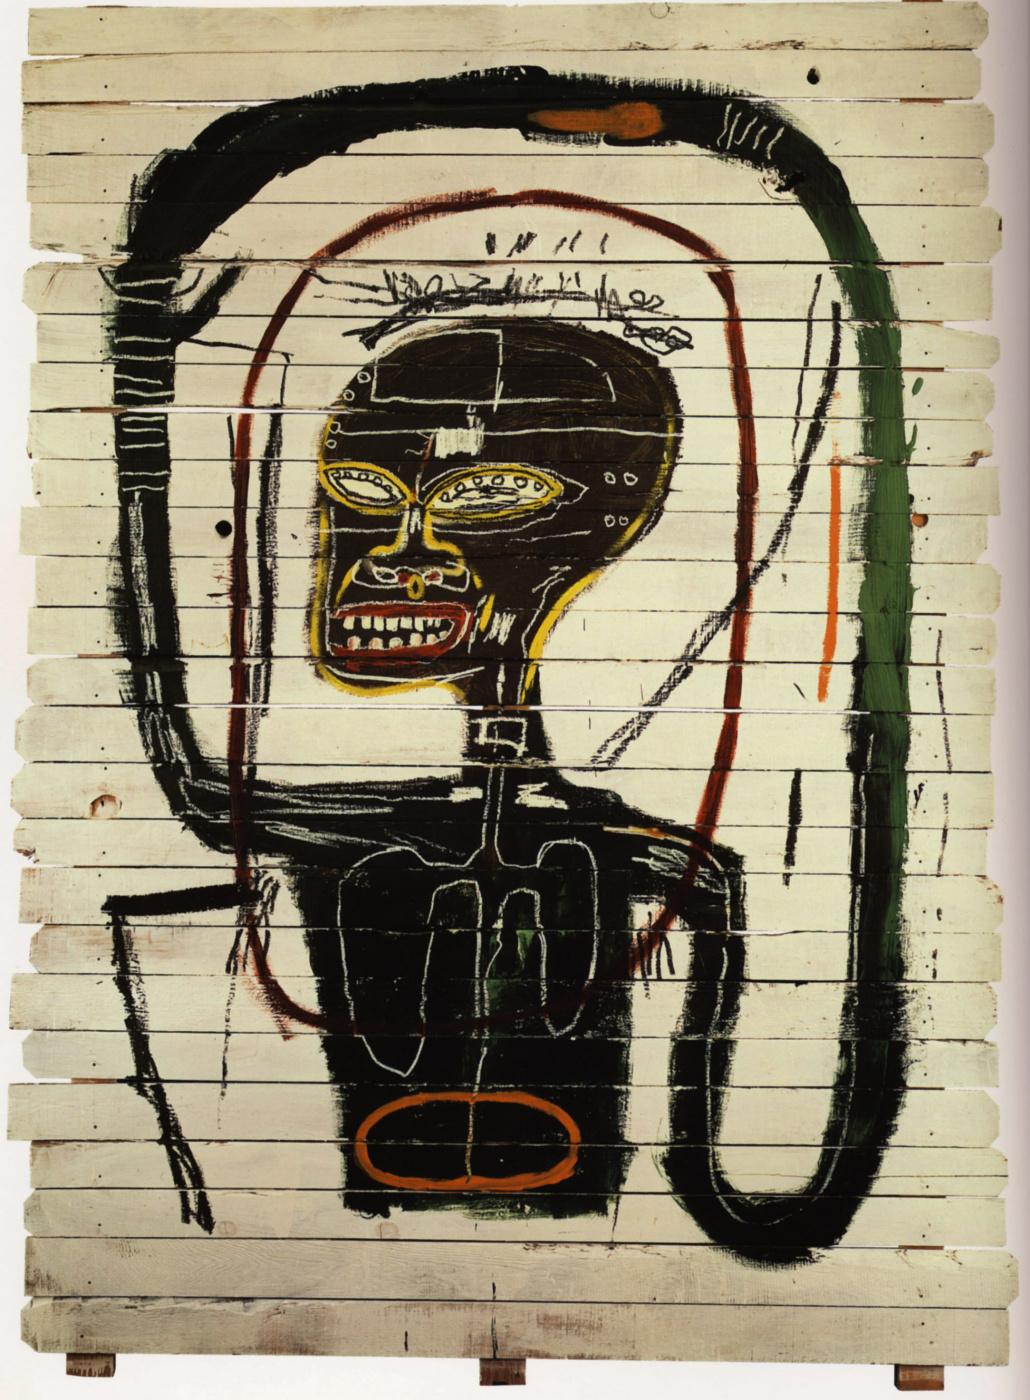 Jean-Michel Basquiat. Flexible